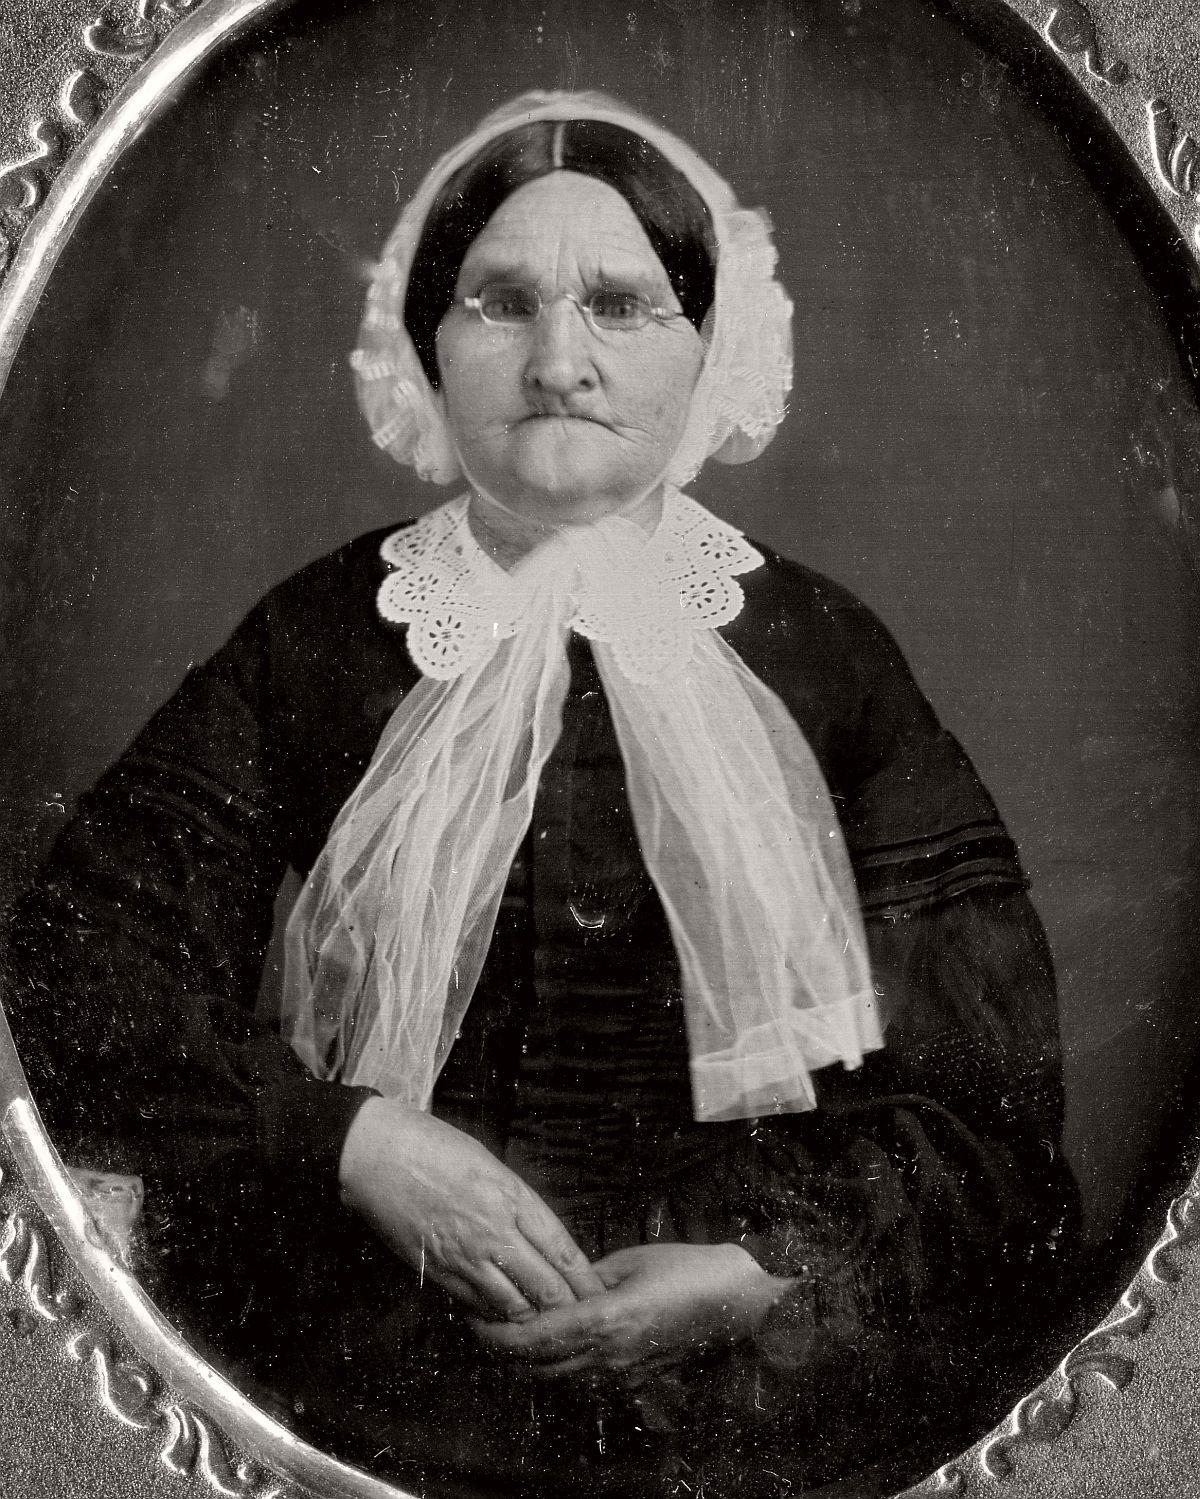 daguerreotype-portrait-ladies-born-in-the-late-18th-century-1700s-vintage-10